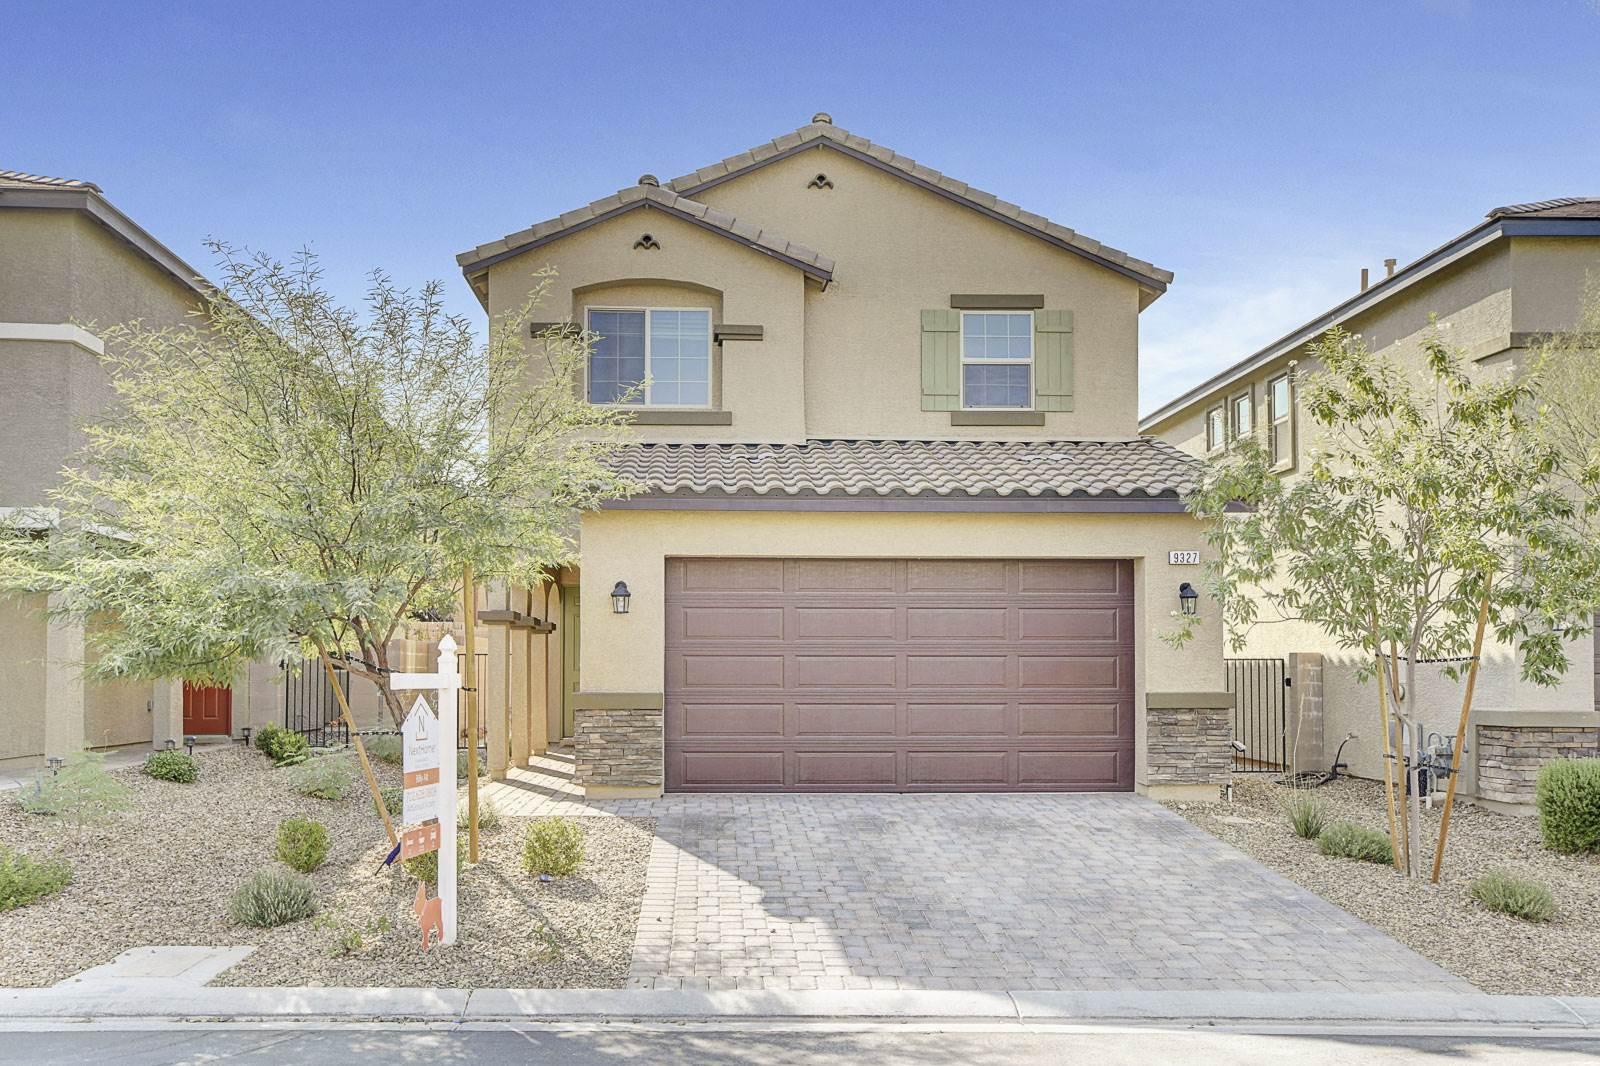 9327 Fire Rose Street, Las Vegas, NV 89178